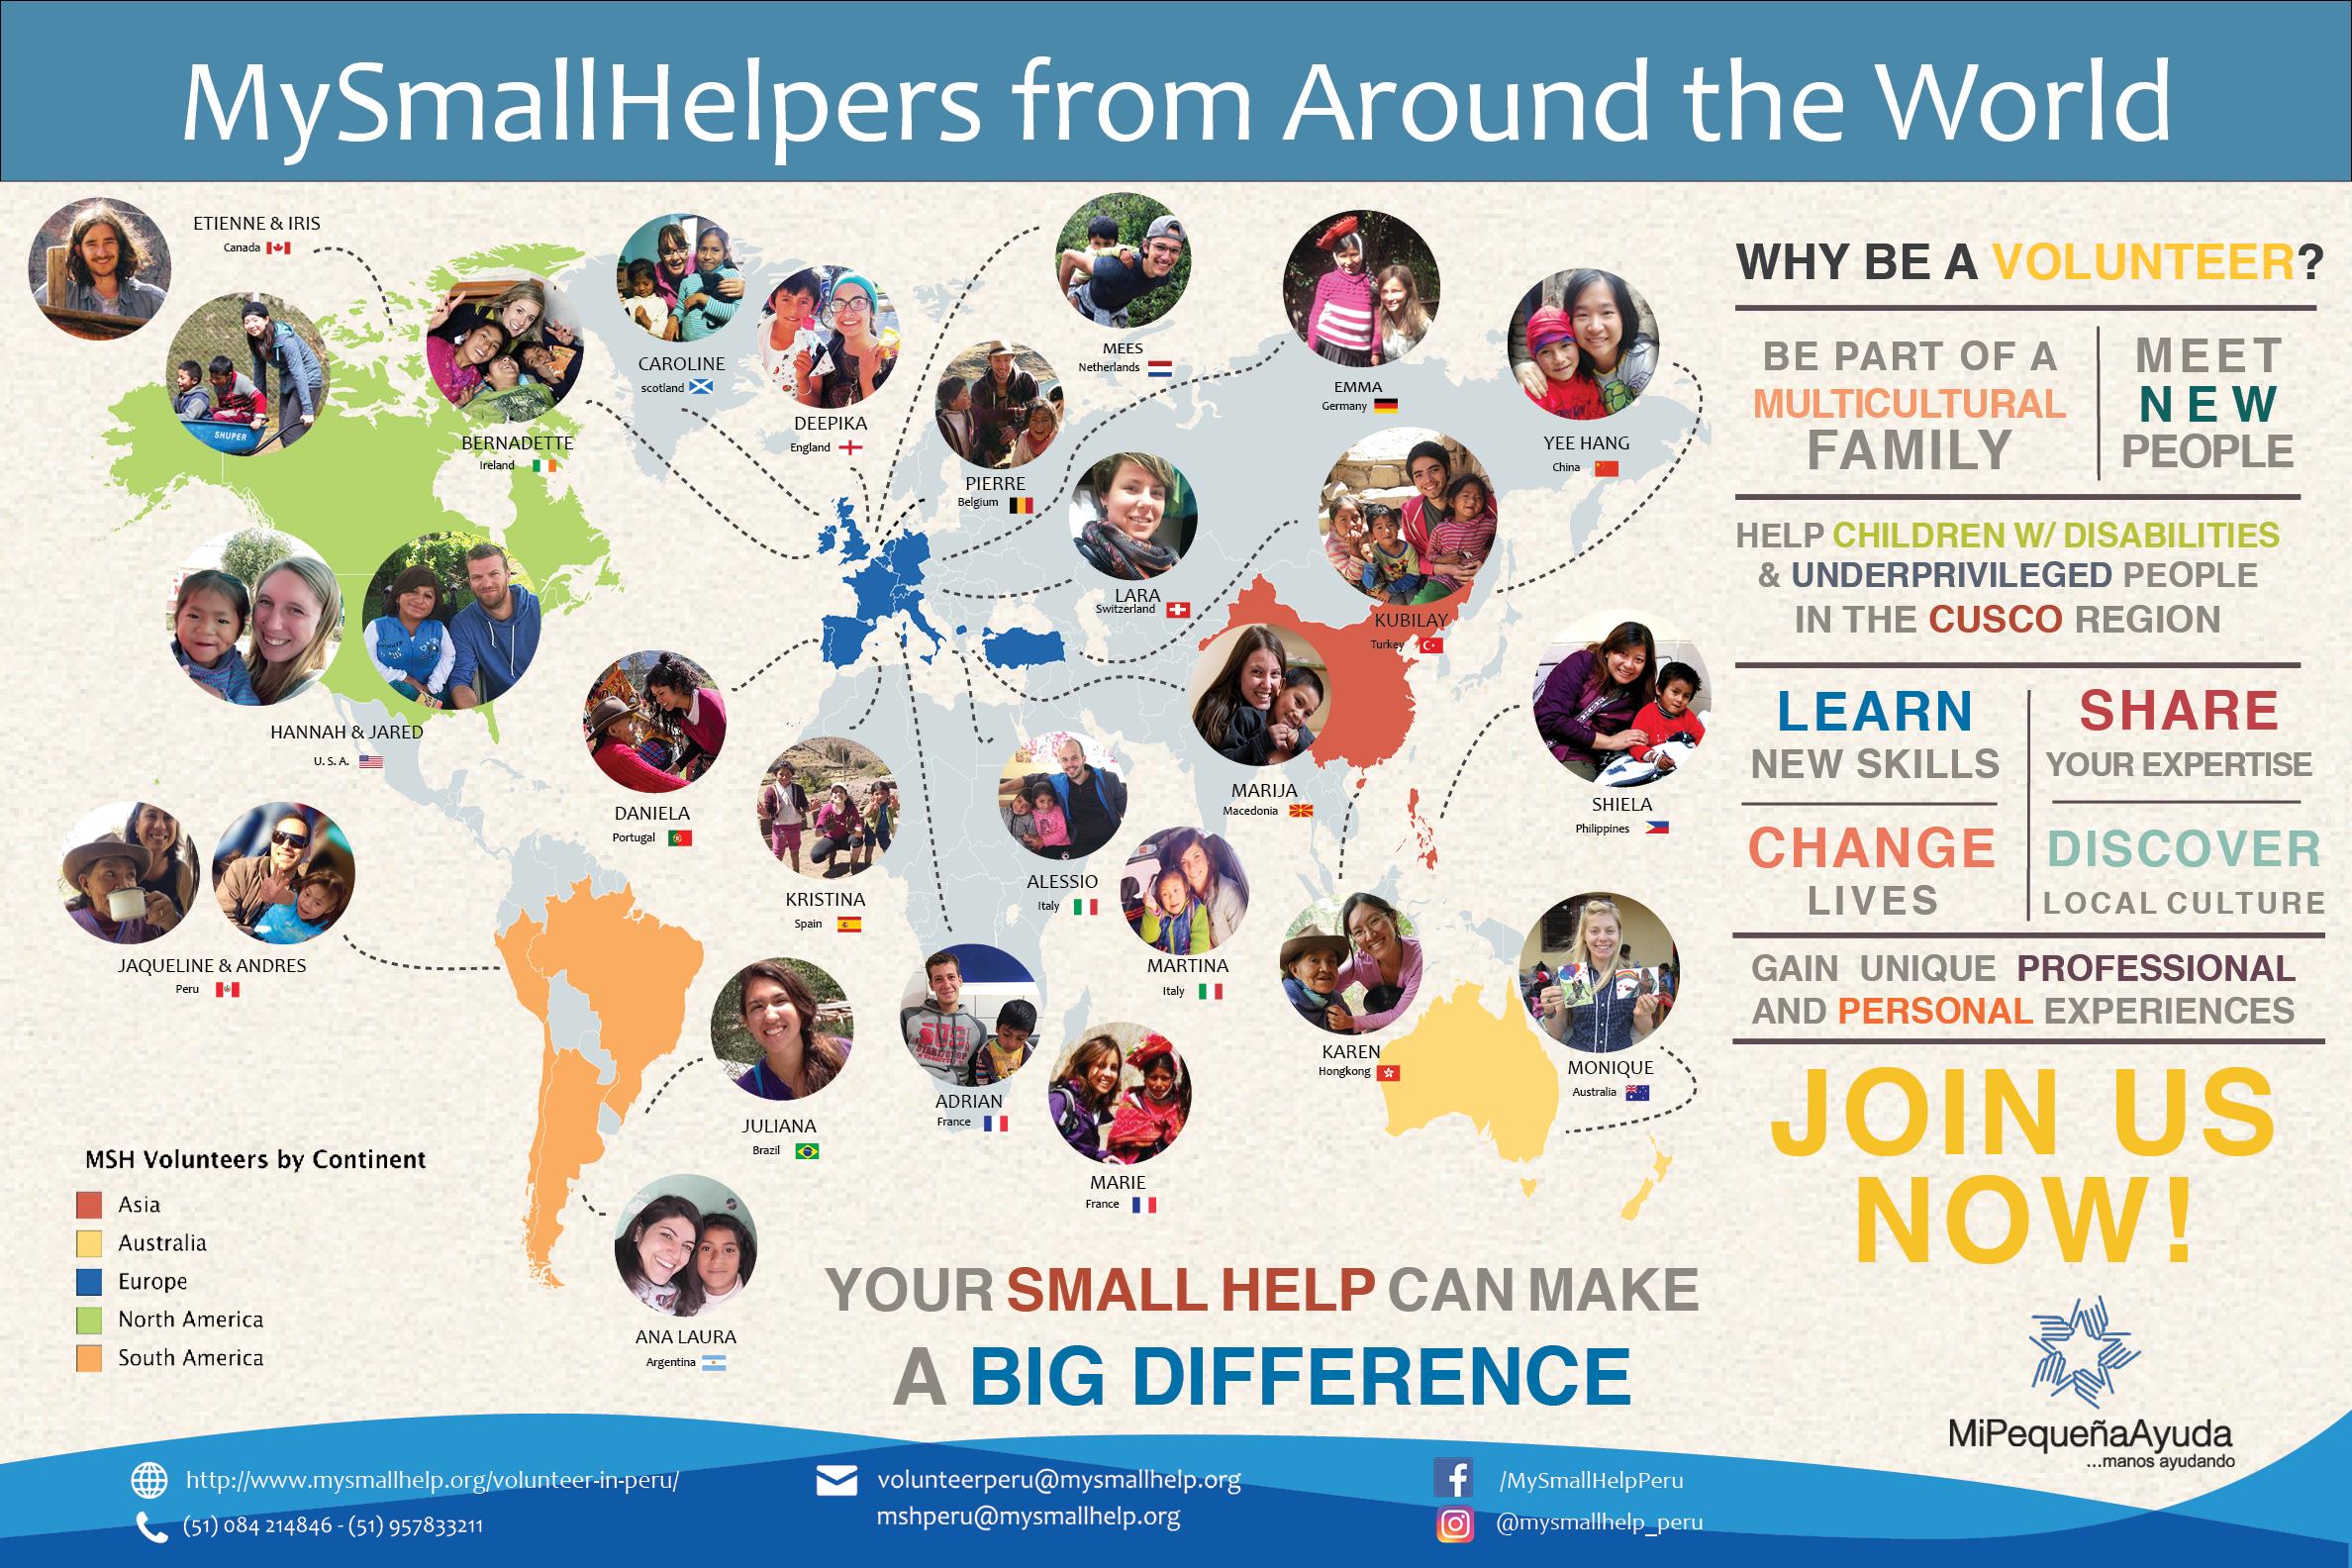 Volunteer in Peru - MiPequeñaAyuda - MySmallHelp Peru